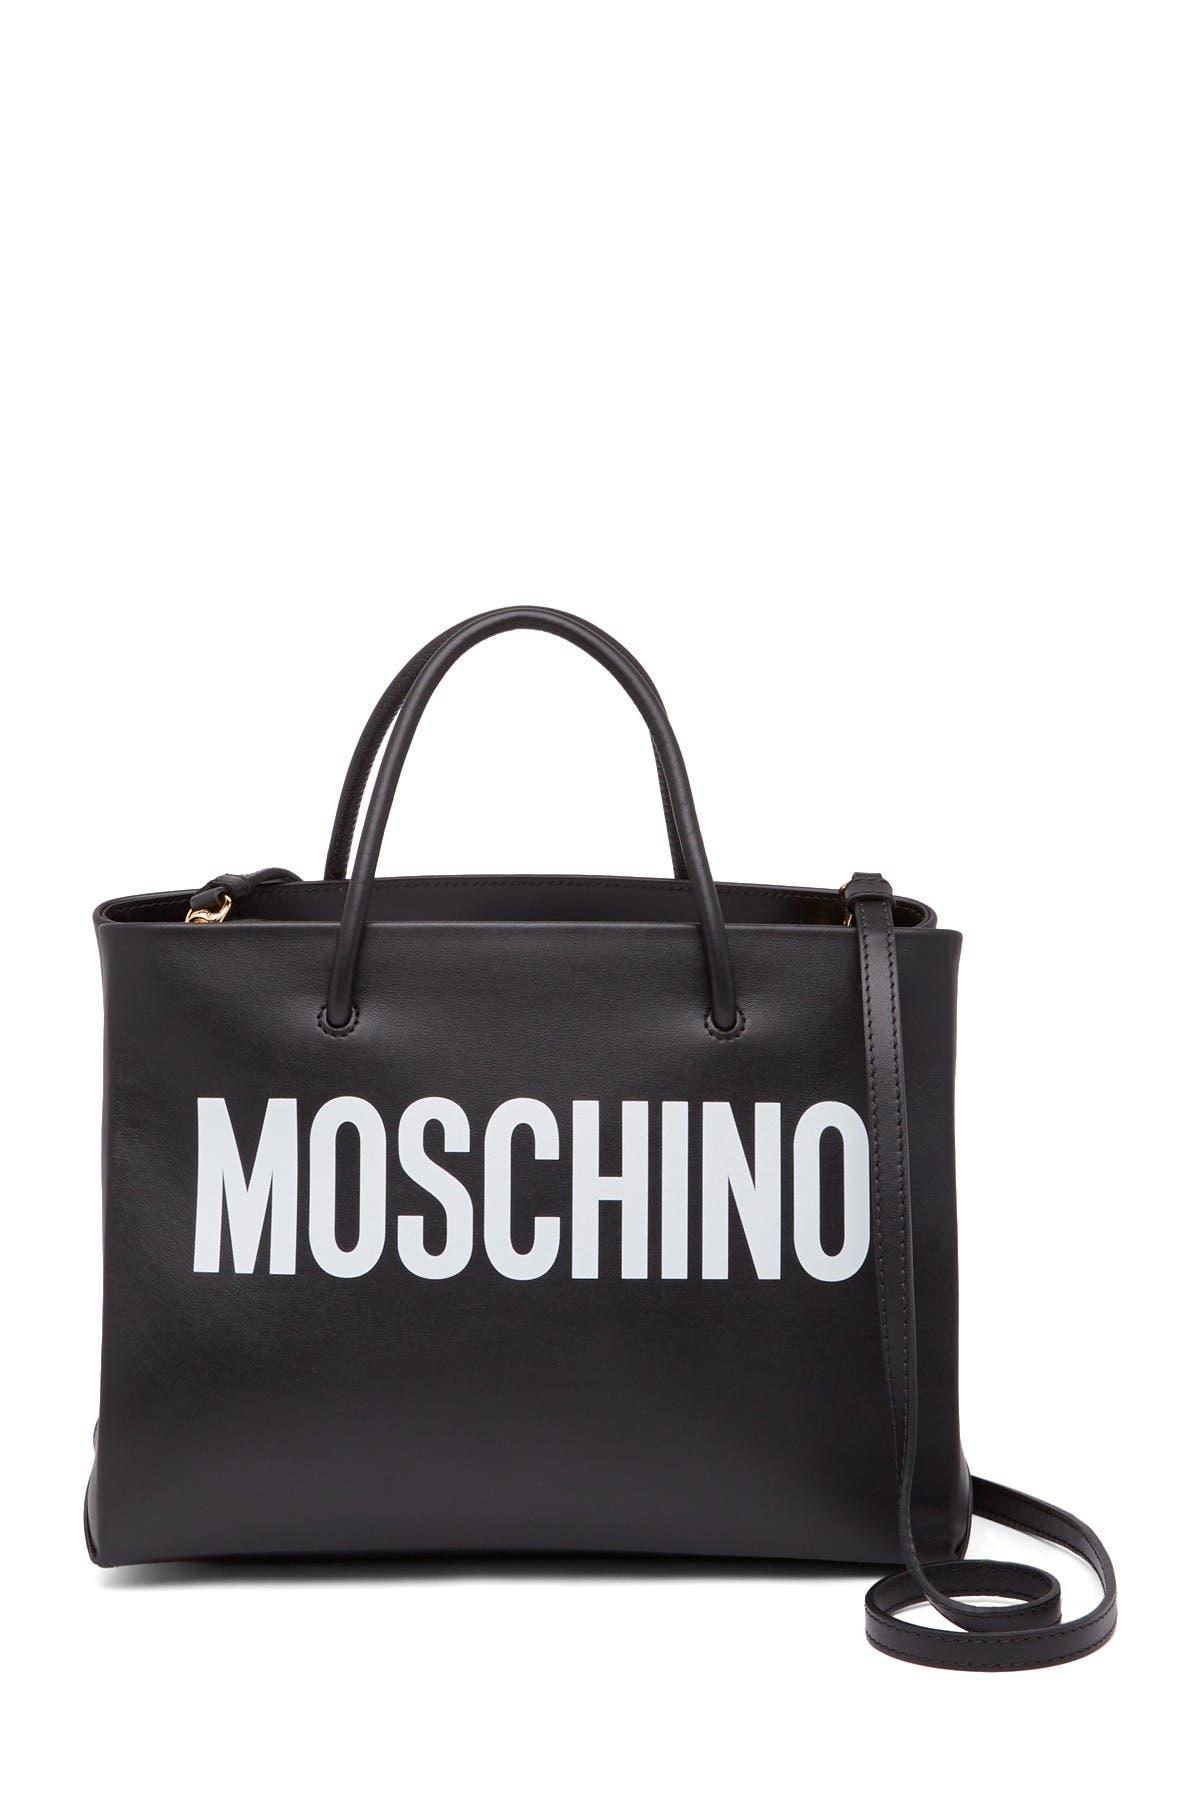 Image of MOSCHINO Logo Printed Leather Mini Tote